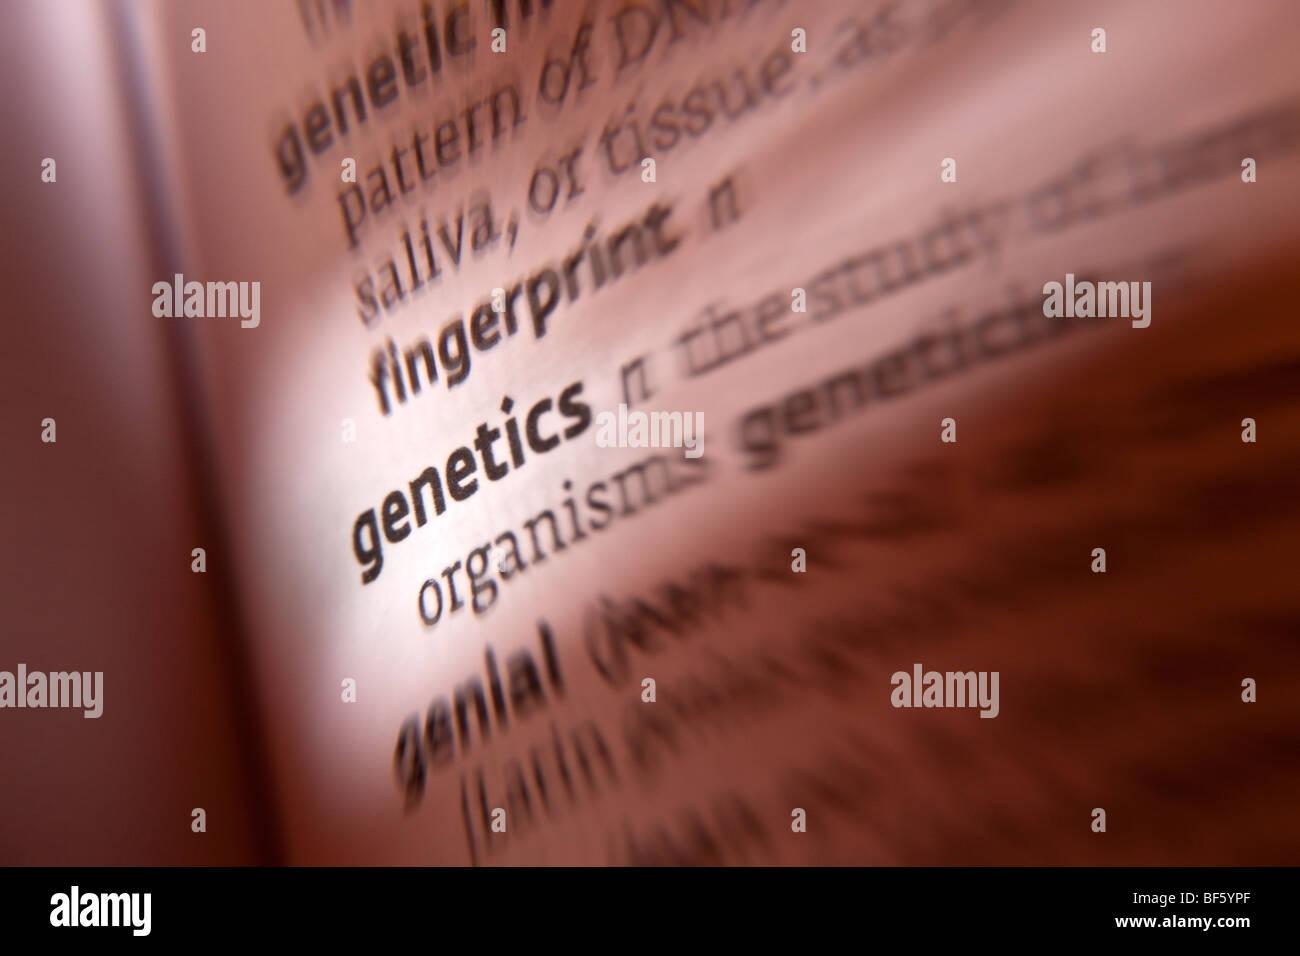 Genetica Immagini Stock